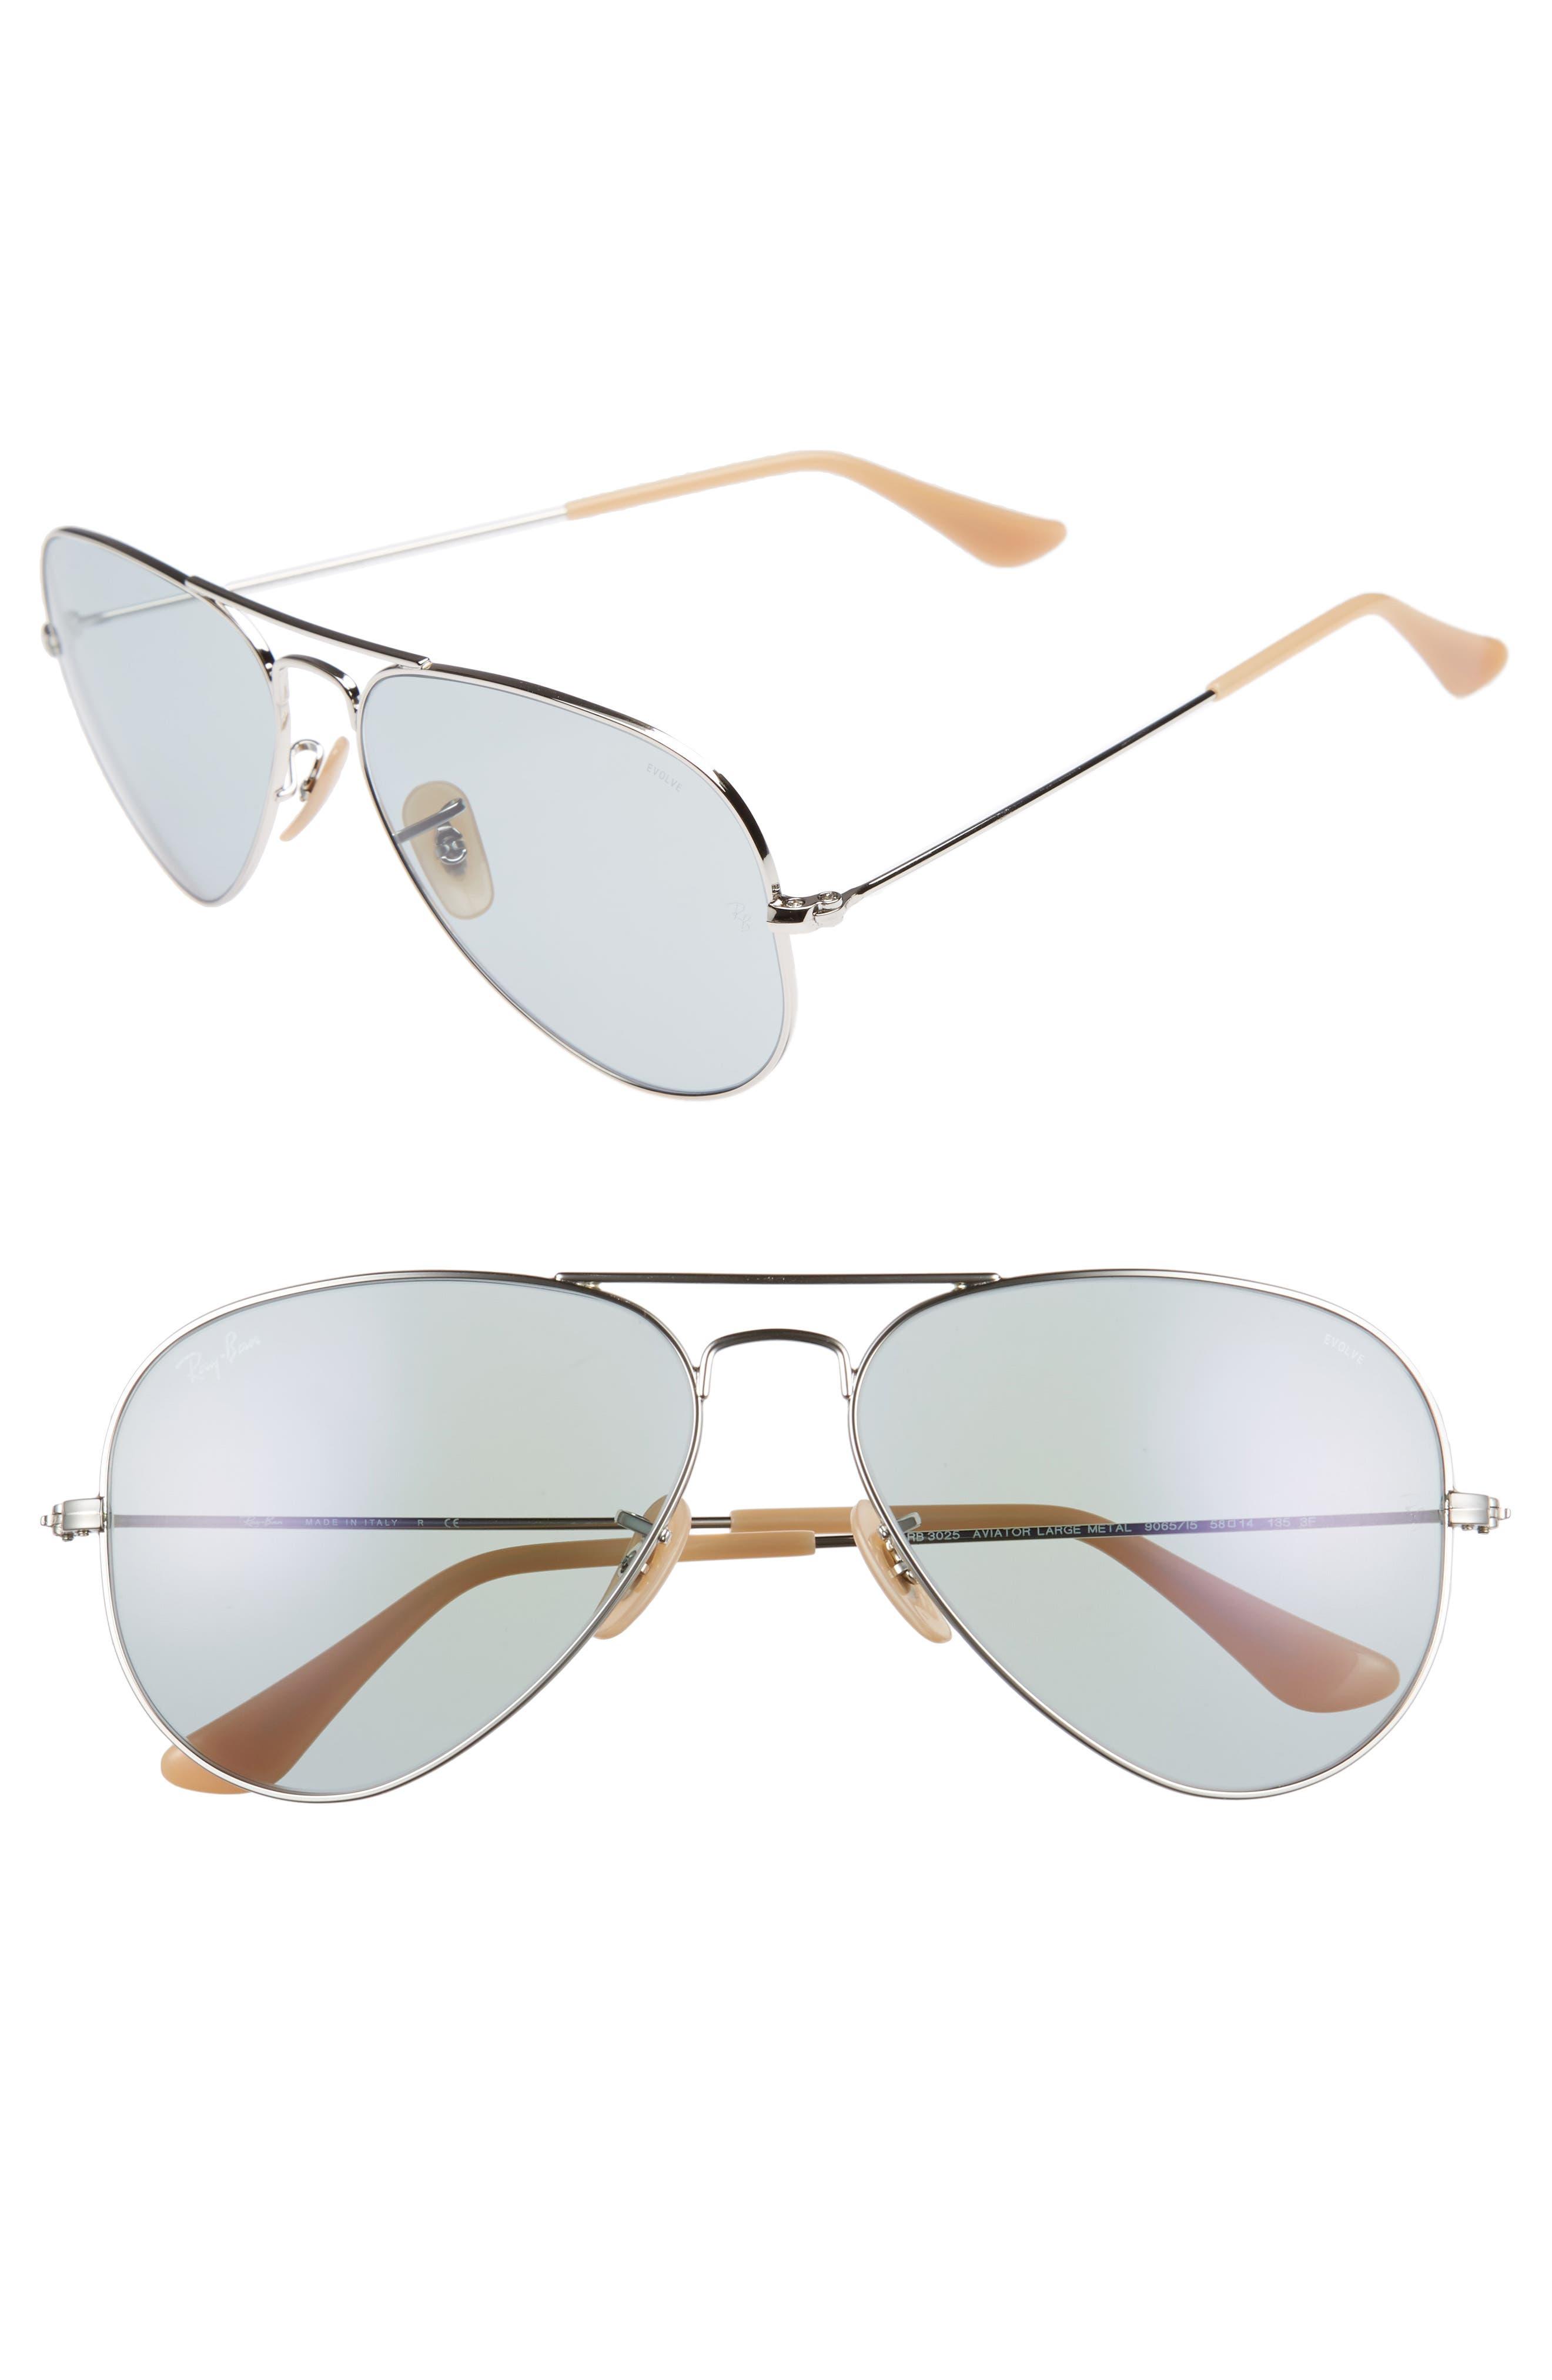 RAY-BAN,                             58mm Photochromic Aviator Sunglasses,                             Main thumbnail 1, color,                             040